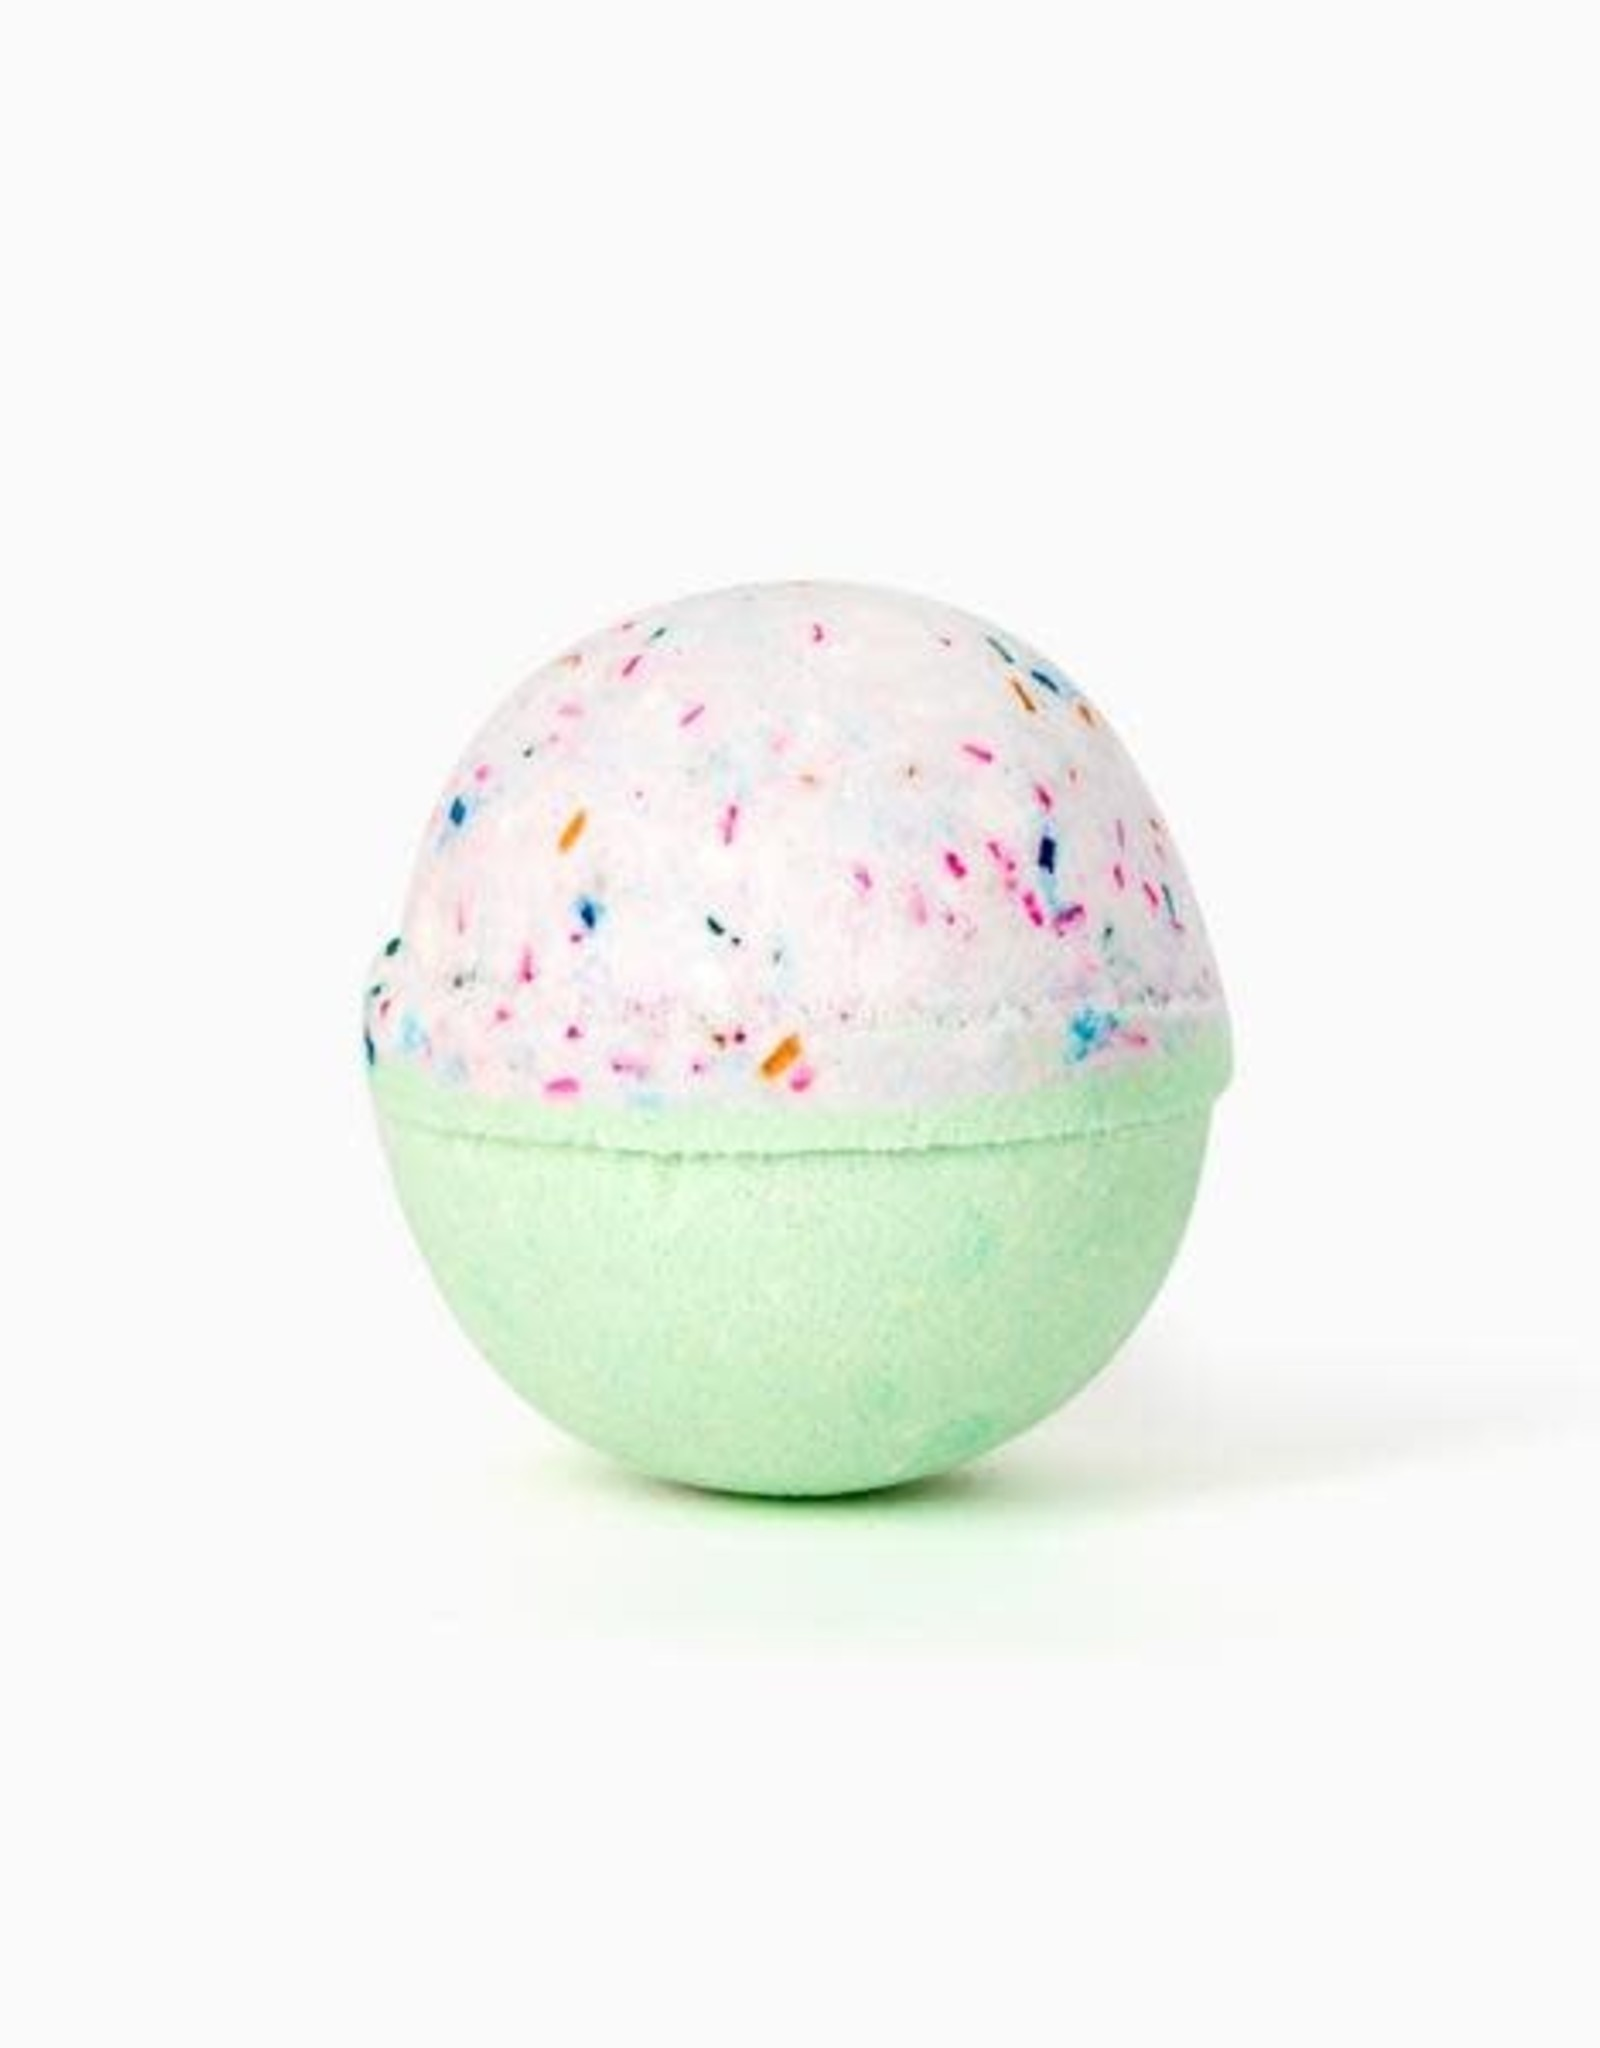 - Birthday Bombshell Bath Bomb